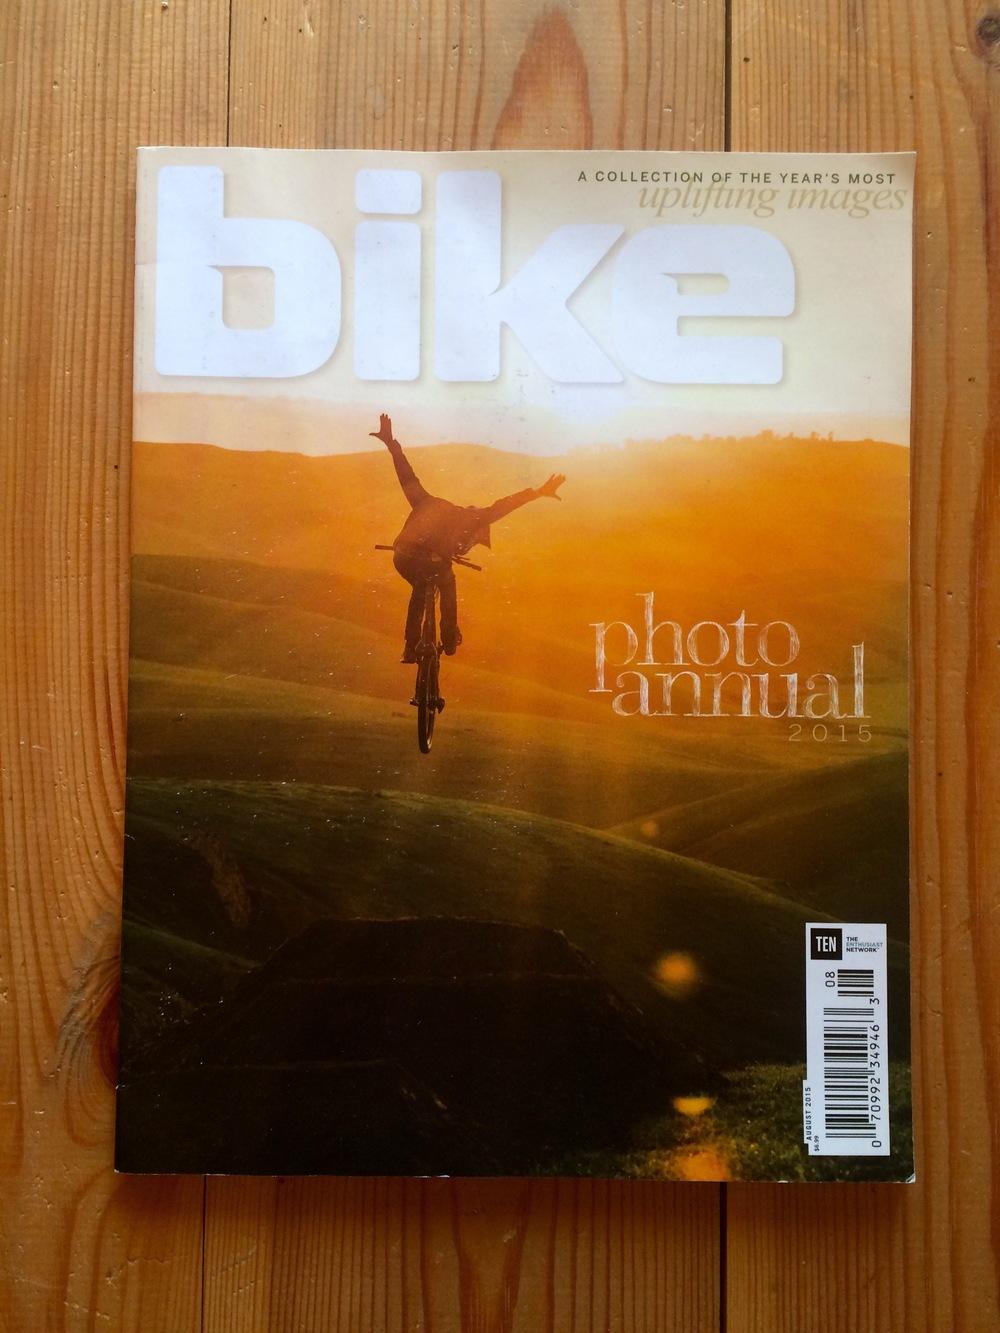 Bike Magazine - Annual Photo Issue 2015